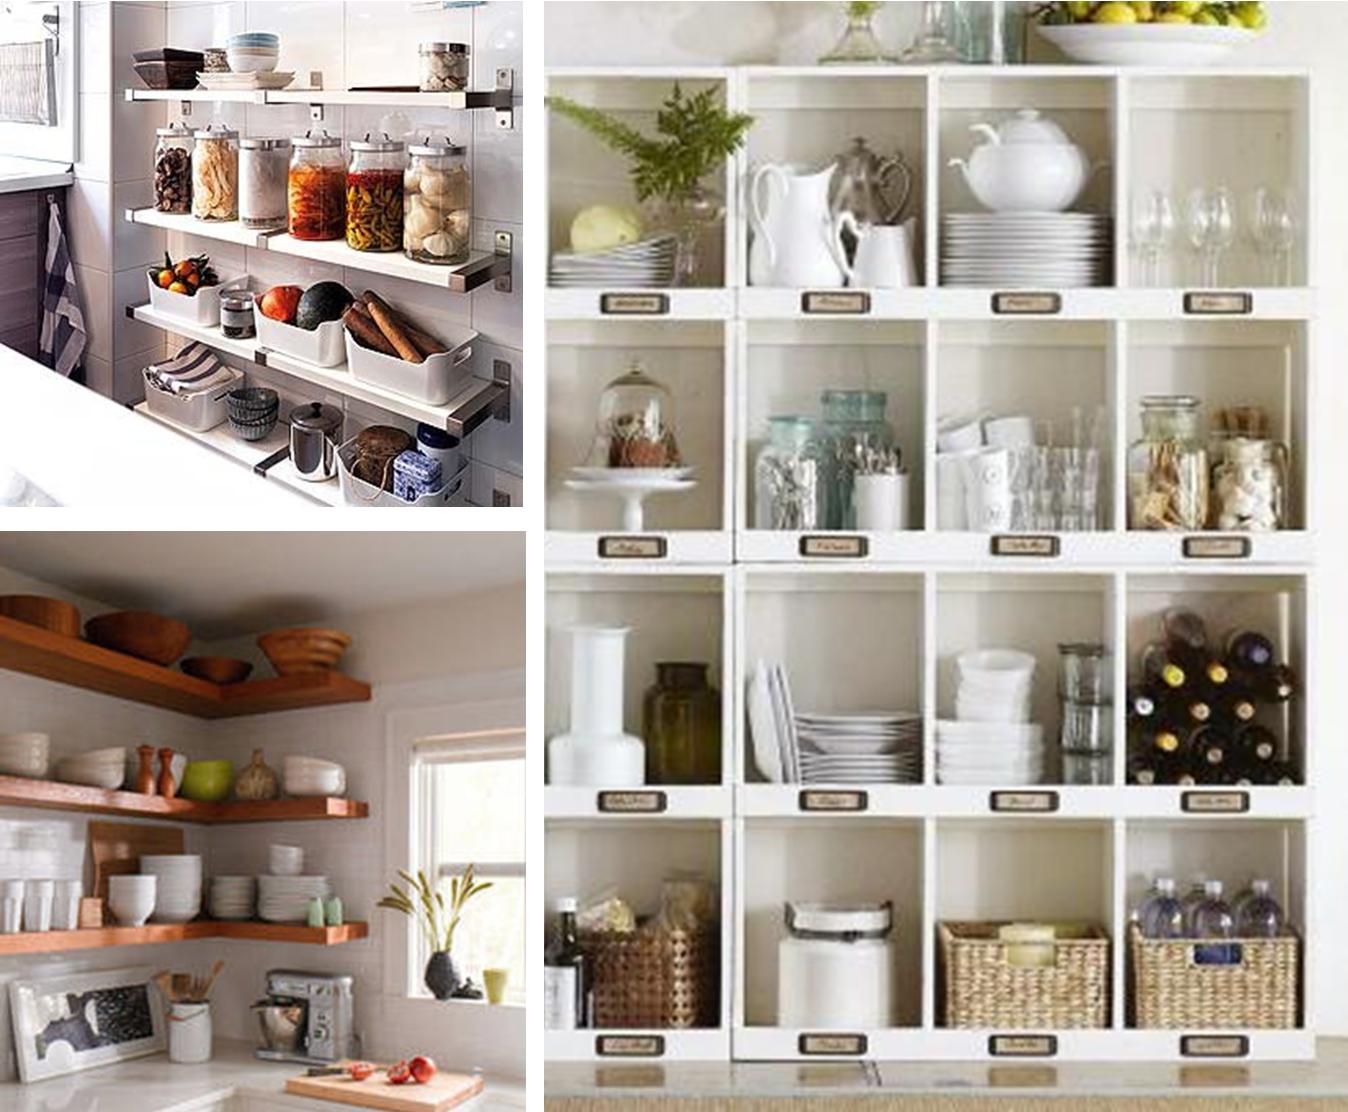 7 ideas para poner en orden la cocina baldas estanter as - Ideas para estanterias ...